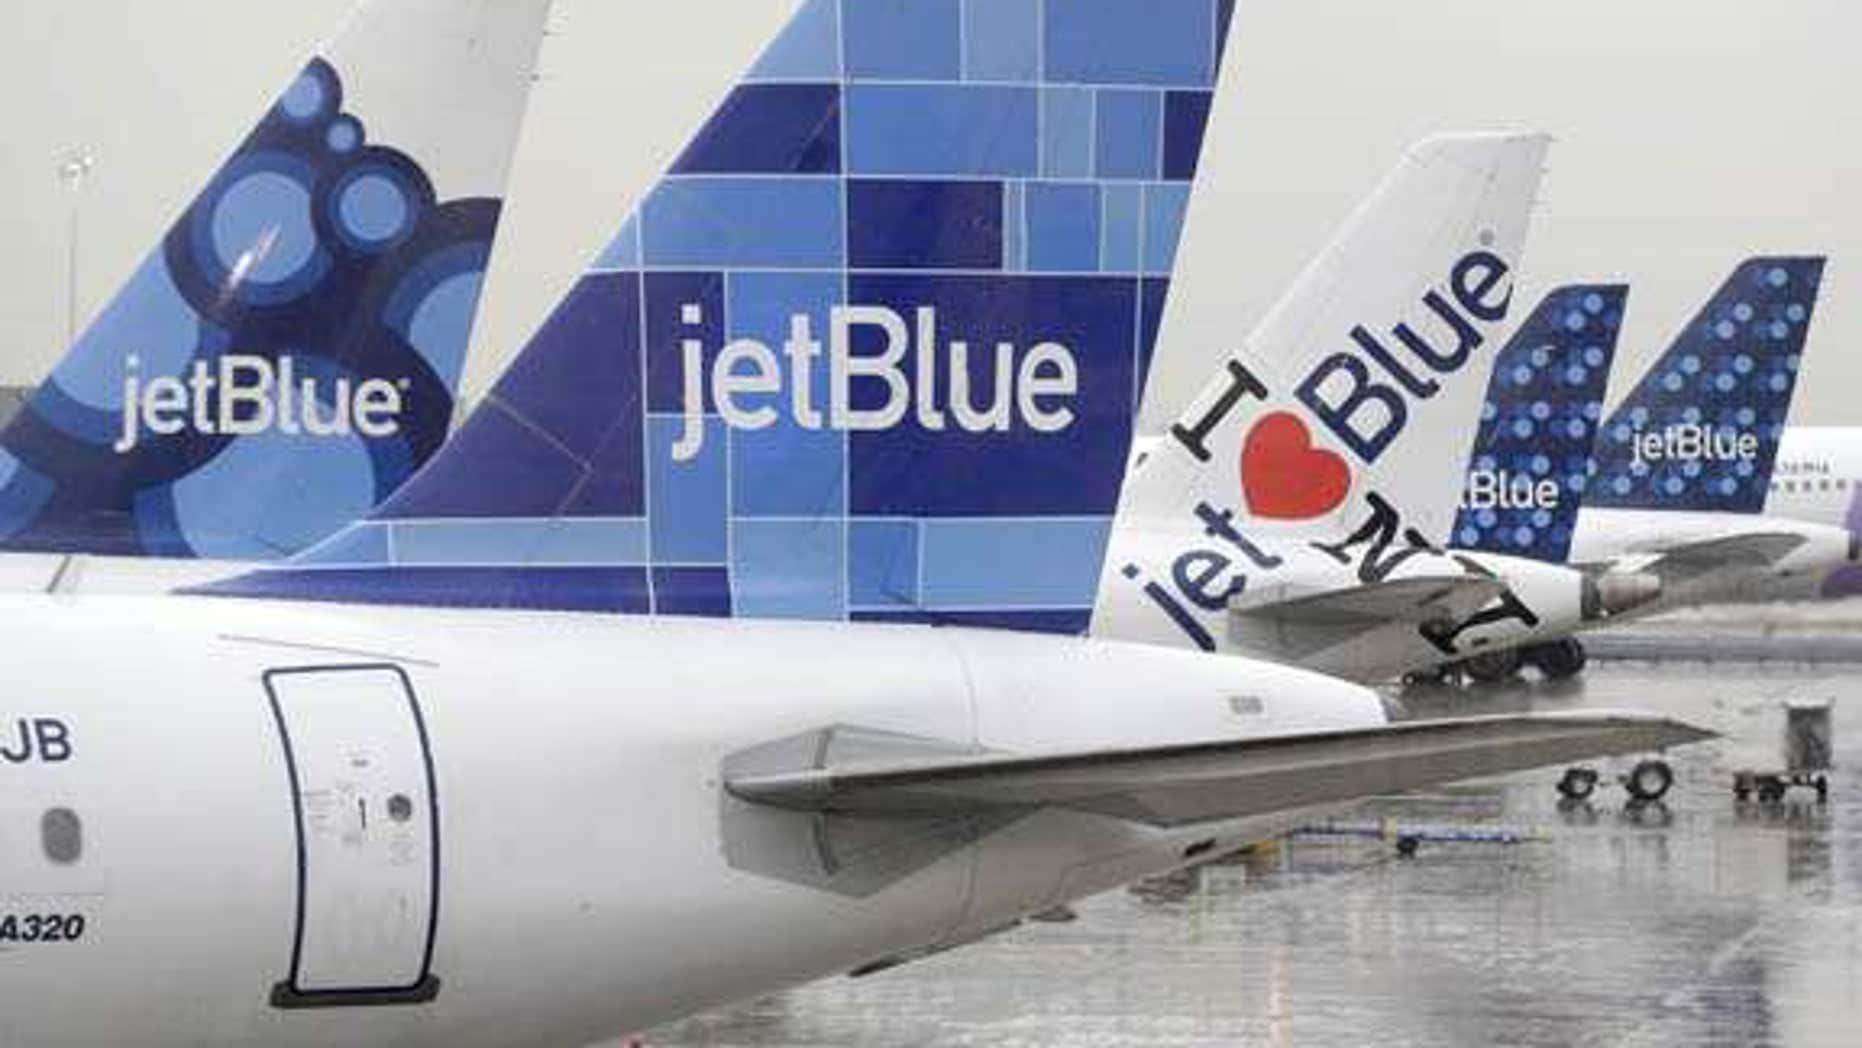 JetBlue airplanes gates at John F. Kennedy International Airport.